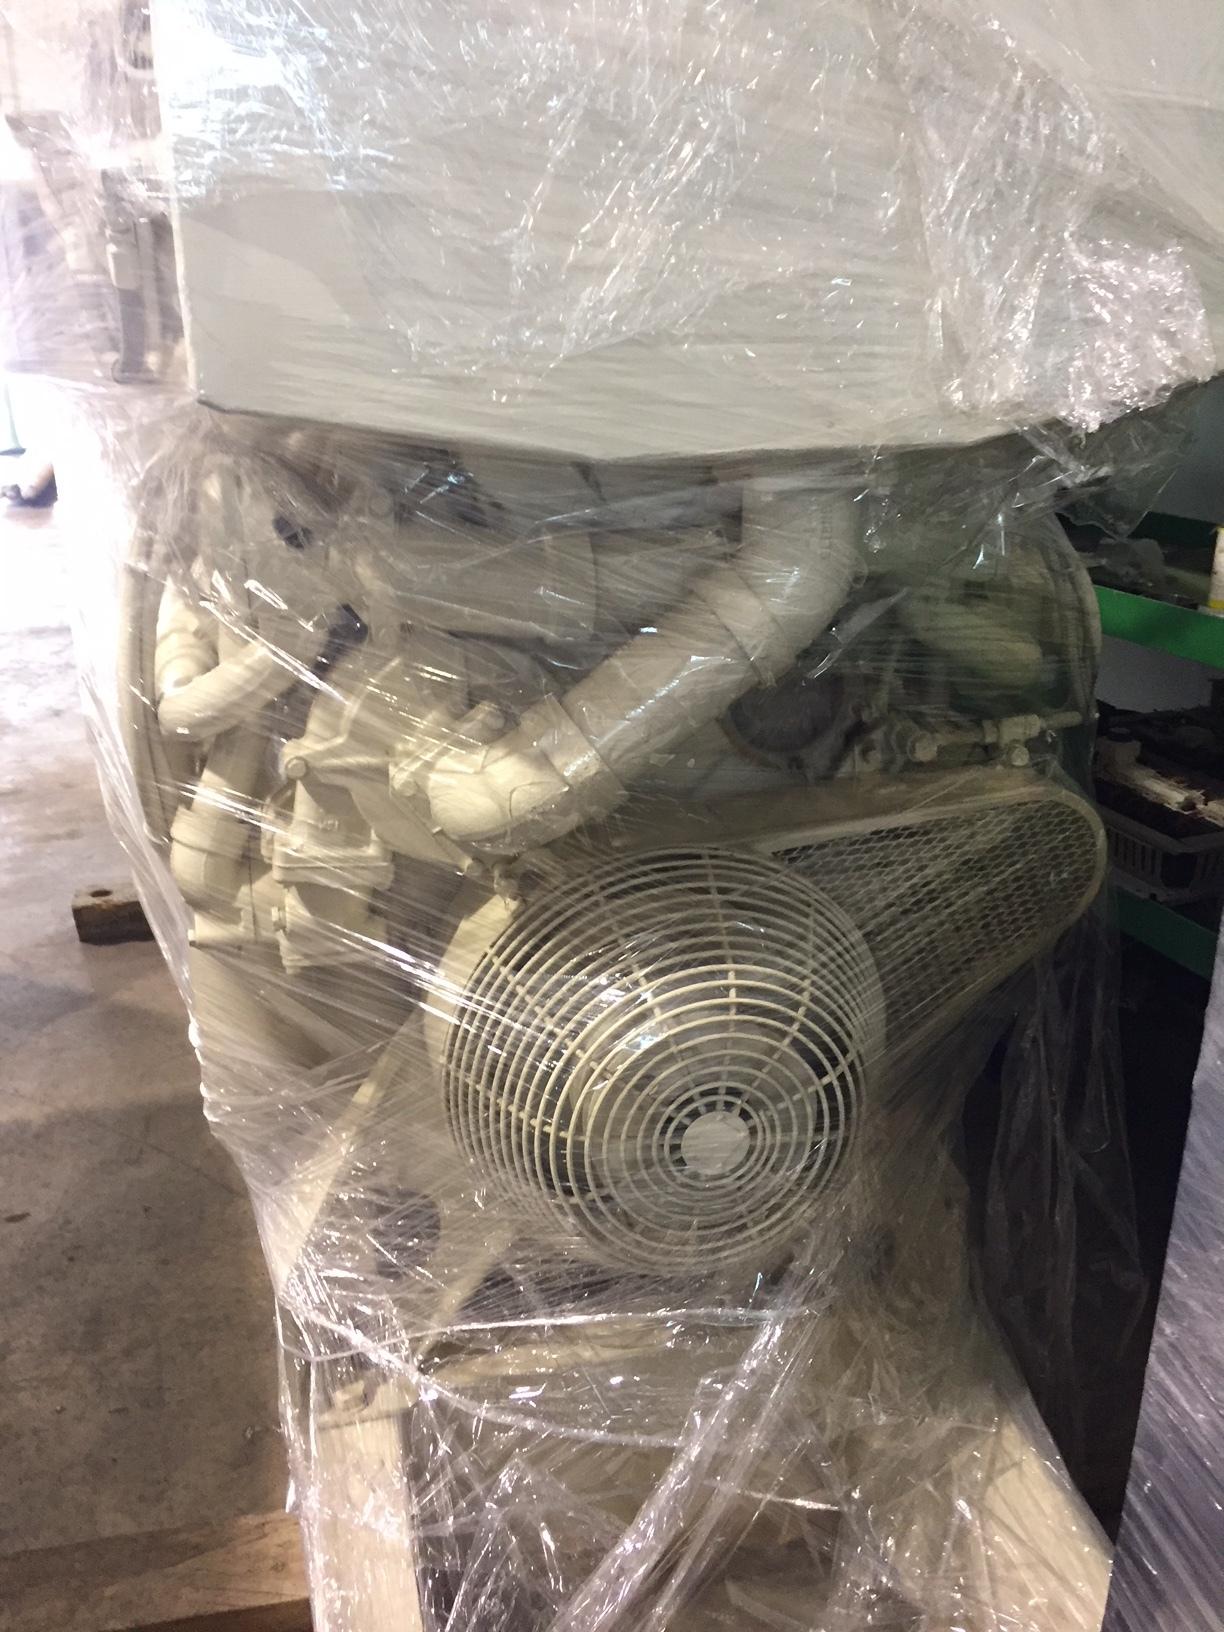 #24783 370 KW Caterpillar 3408 Generator